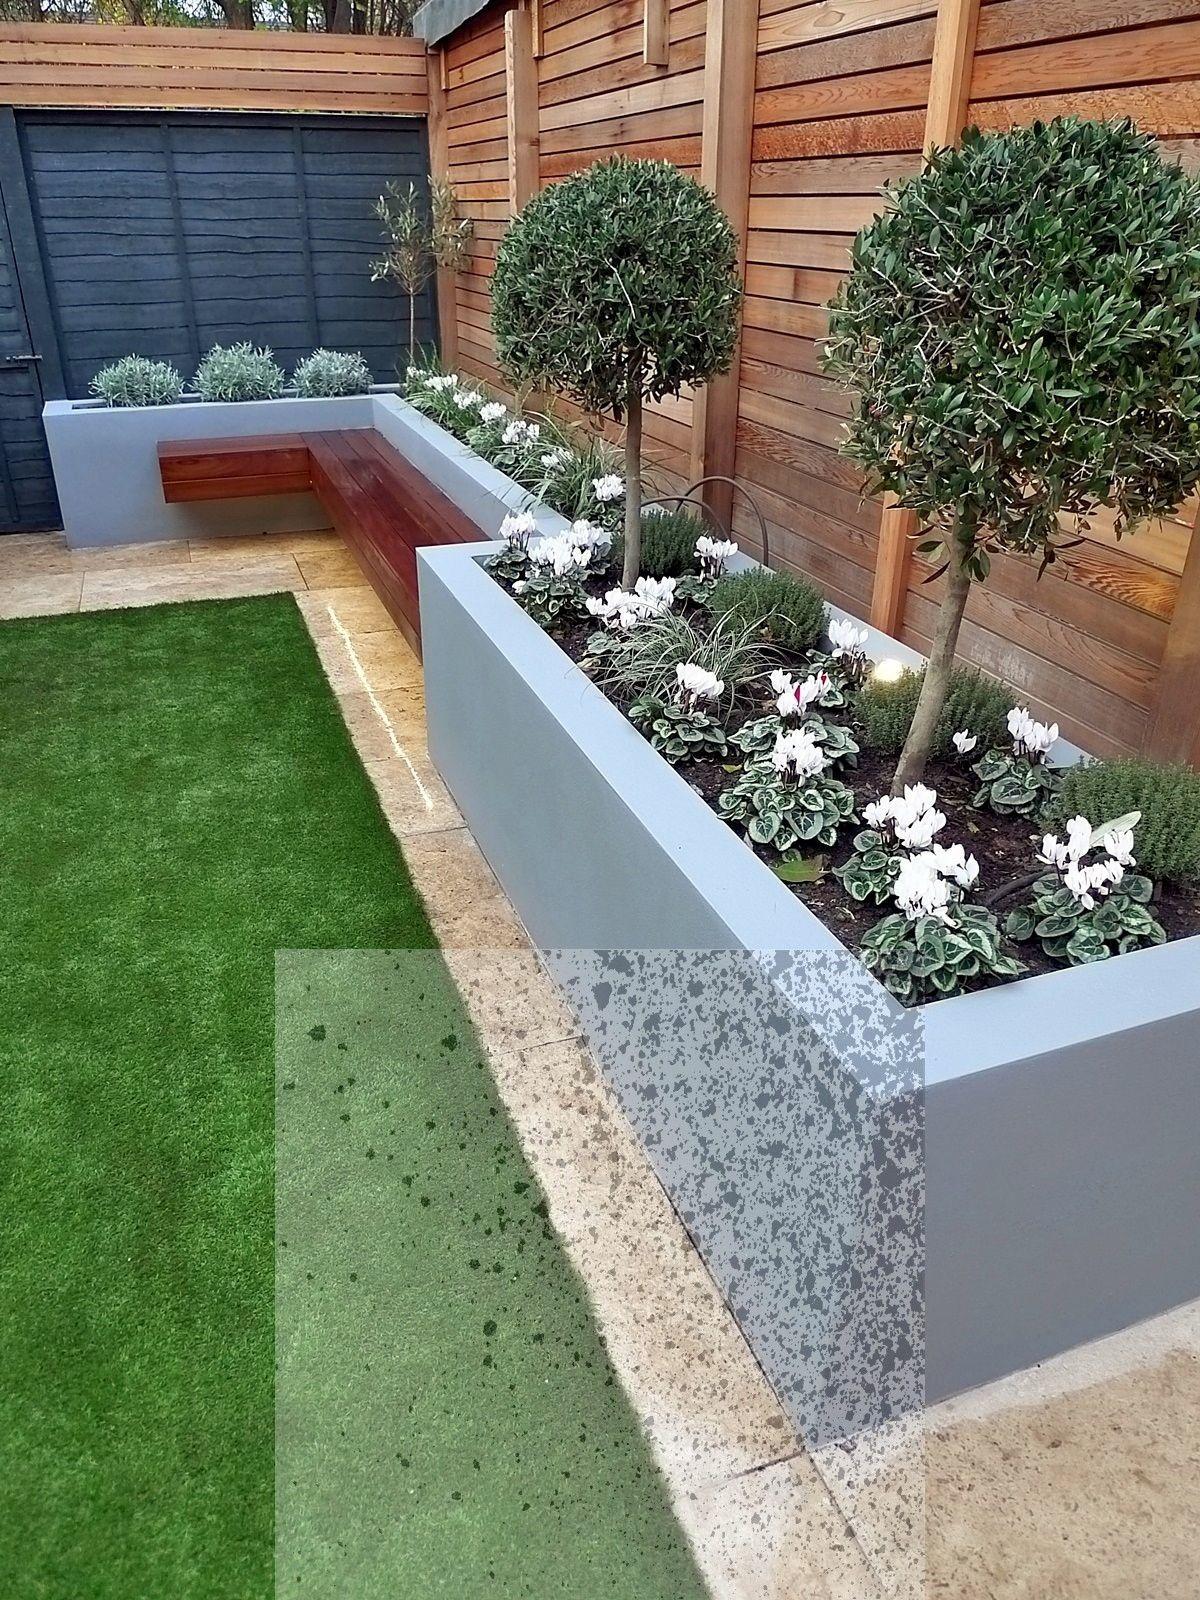 13 Superb Plants Outdoor Low Maintenance Ideas Modern Garden Design Back Garden Design Backyard Landscaping Designs